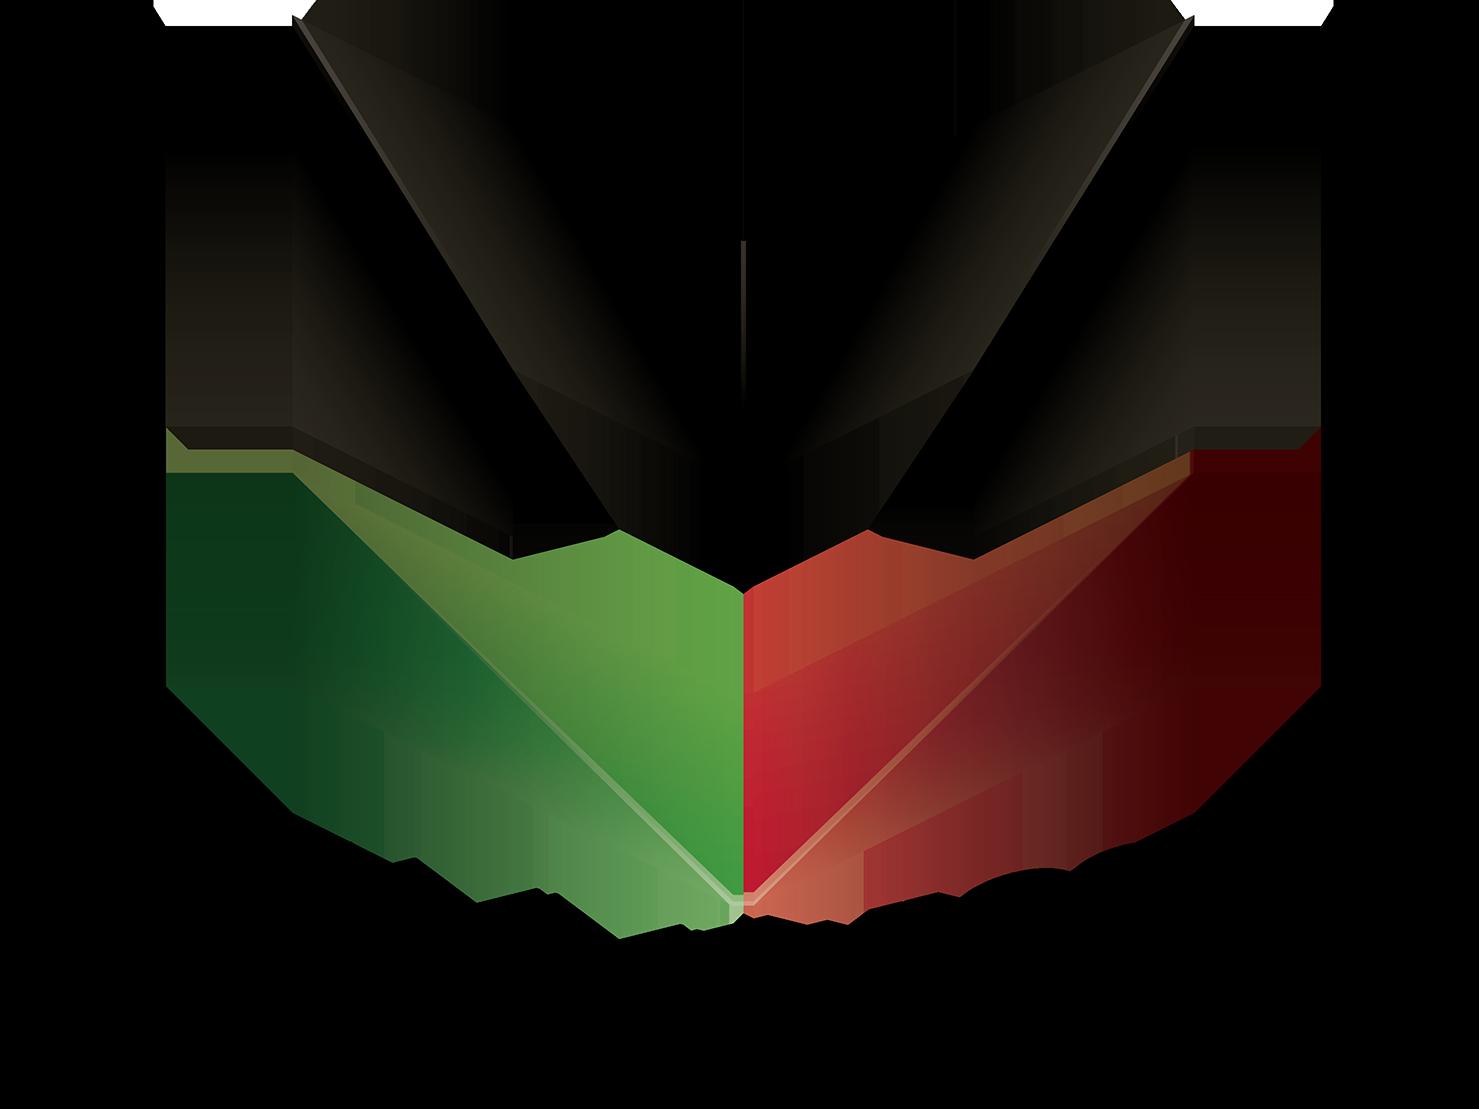 STEAMEXICO-MX-NEGRO-1479-X-1109-STEAM-MEXICO-LOGO-COMUNIDAD-STEAM-MEXICO-LAGLVL.COM-WWW.STEAMMEXICO.MX-STEAM-MEXICO-DISCORD-STEAM-KEYS-RANDOM-KEY-GRATIS